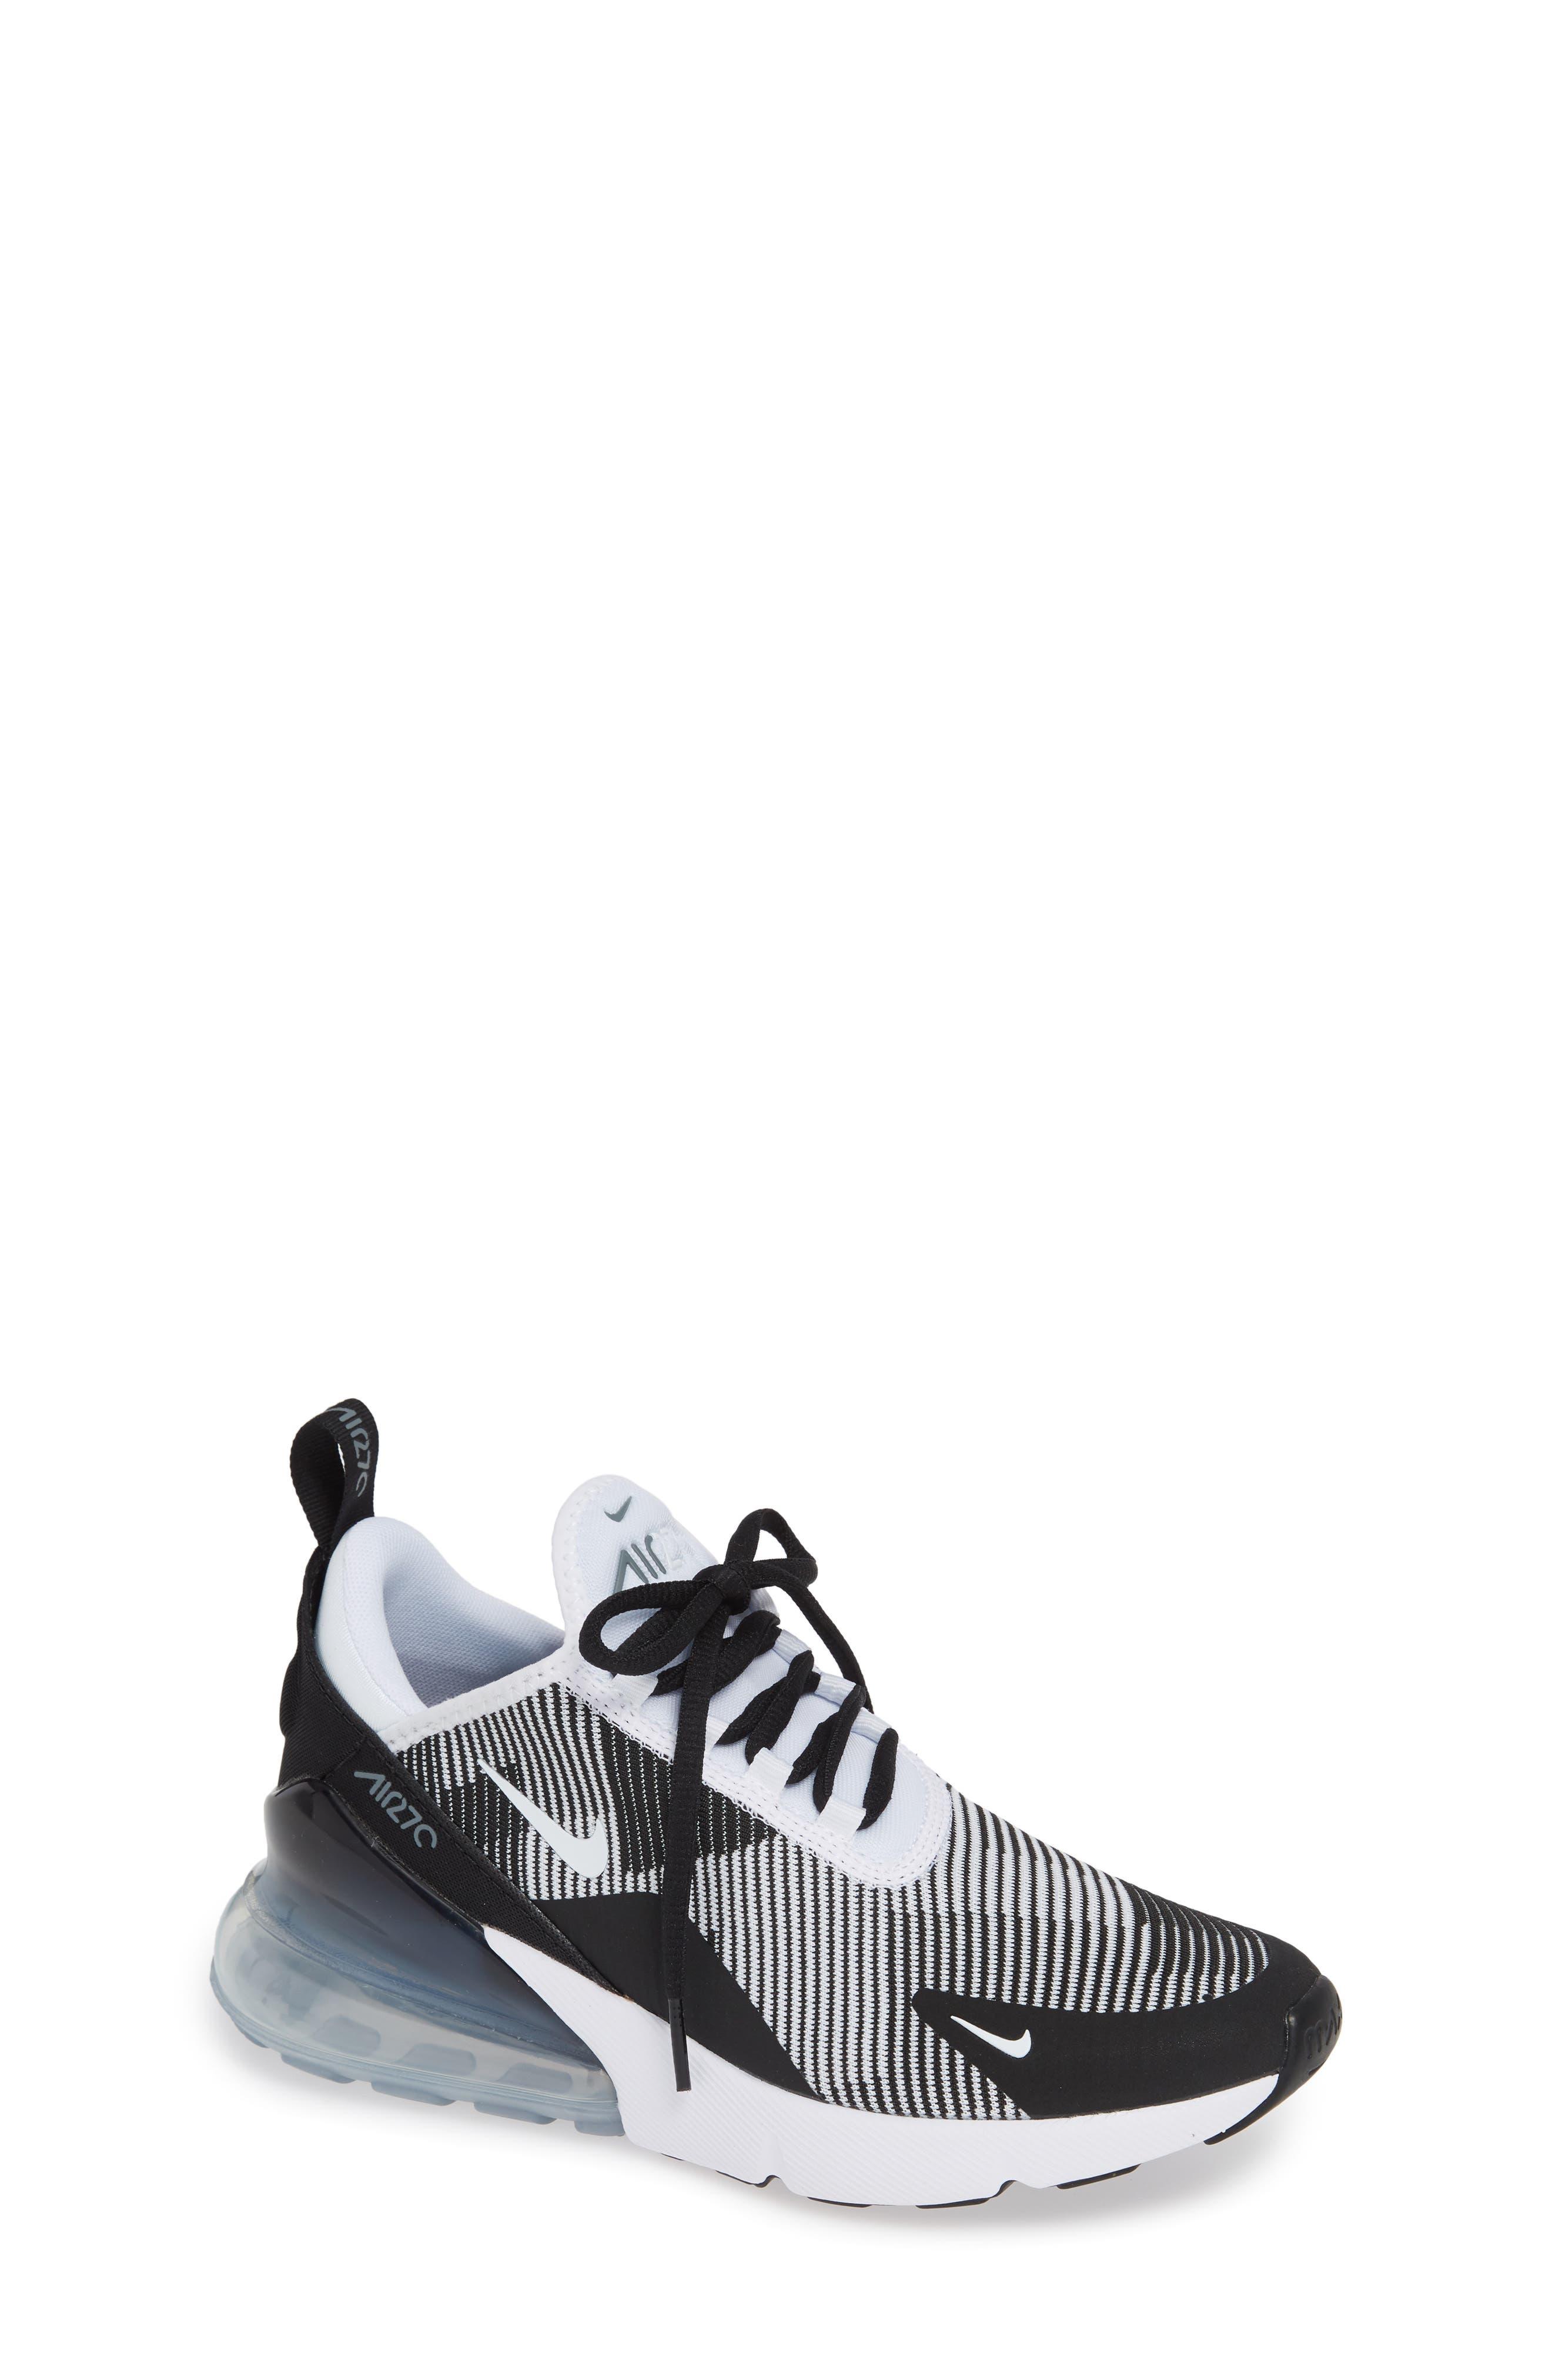 Air Max 270 Sneaker,                             Main thumbnail 1, color,                             BLACK/ WHITE/ GREY/ SILVER